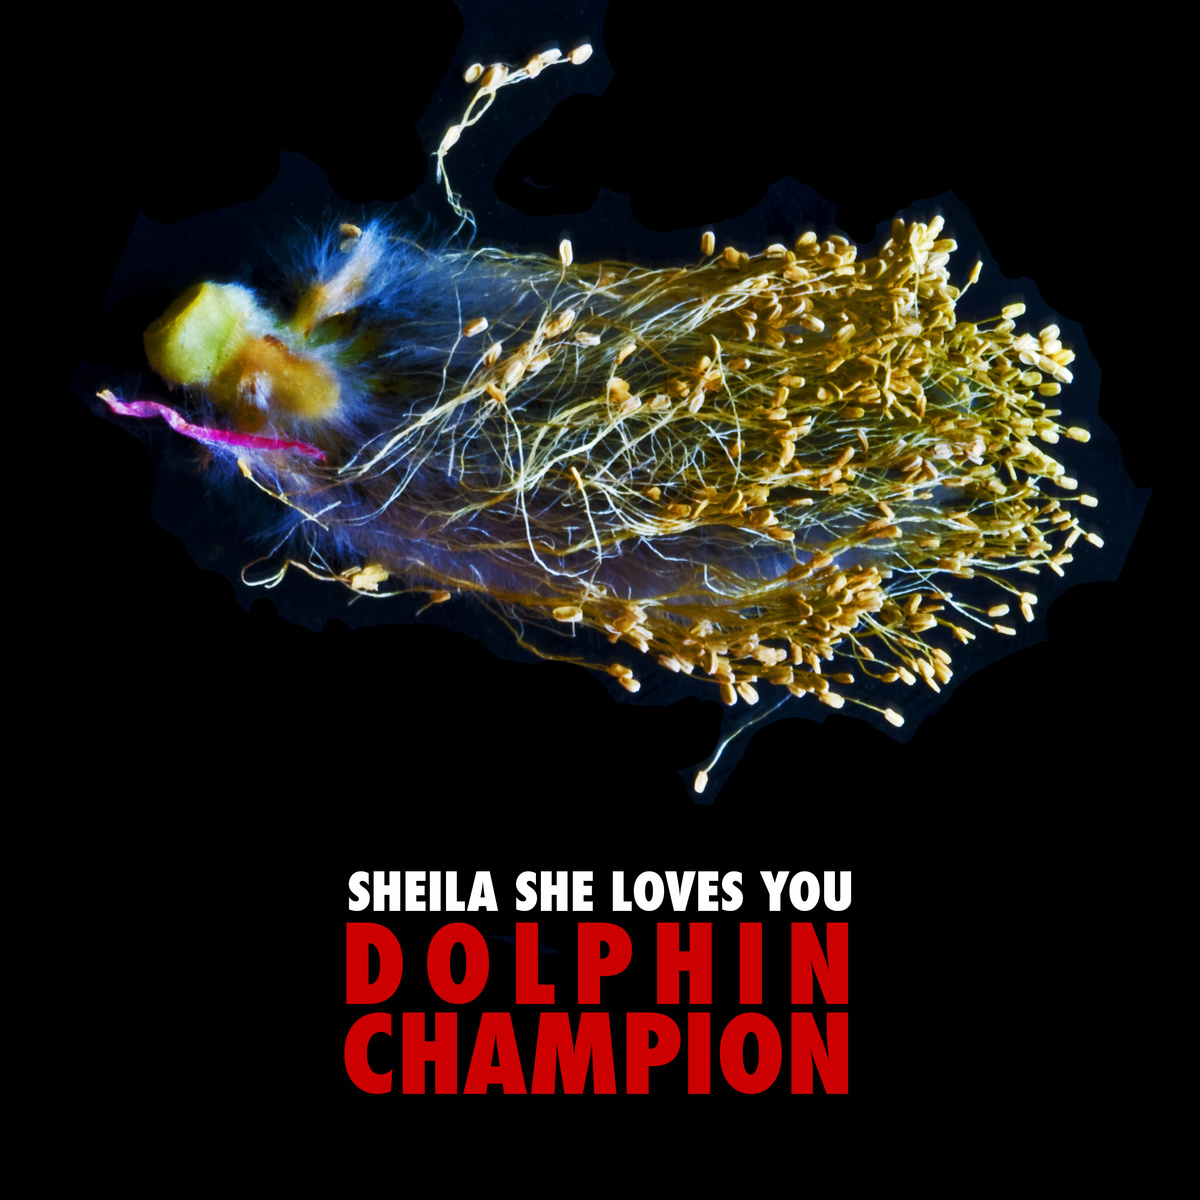 Sheilas, Single Produktion